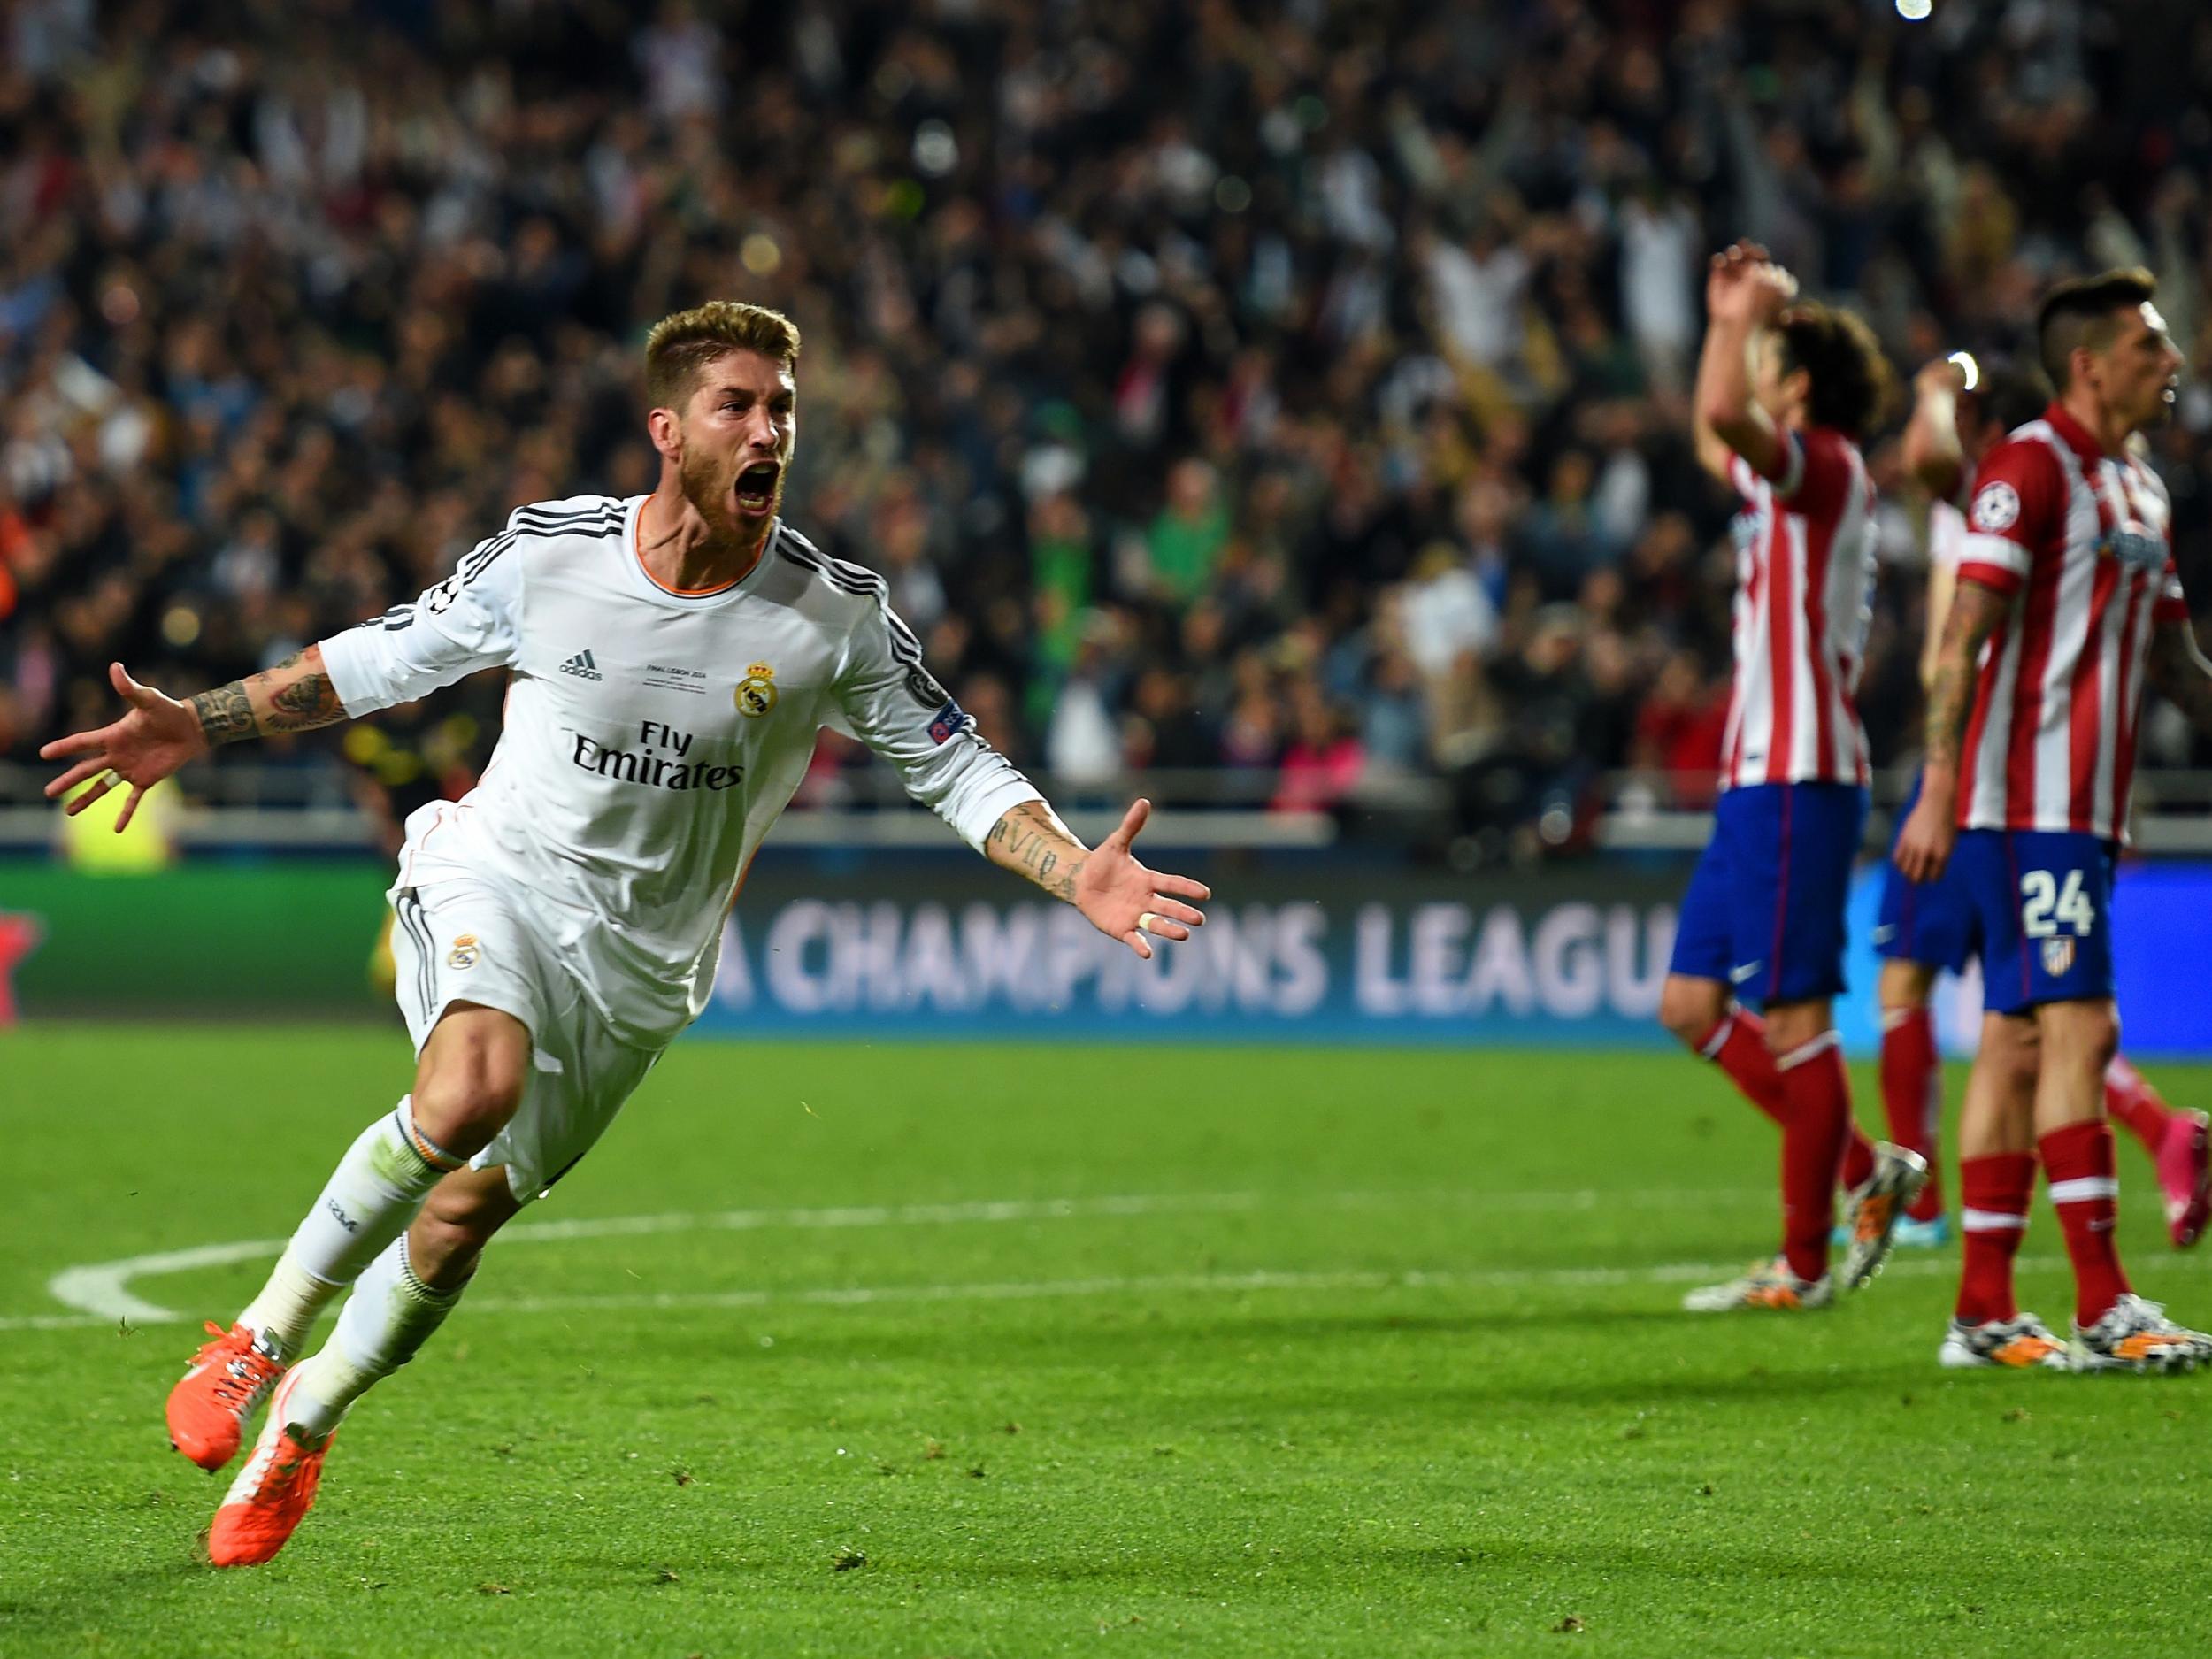 Real Madrid captain Sergio Ramos contemplates changing his shirt